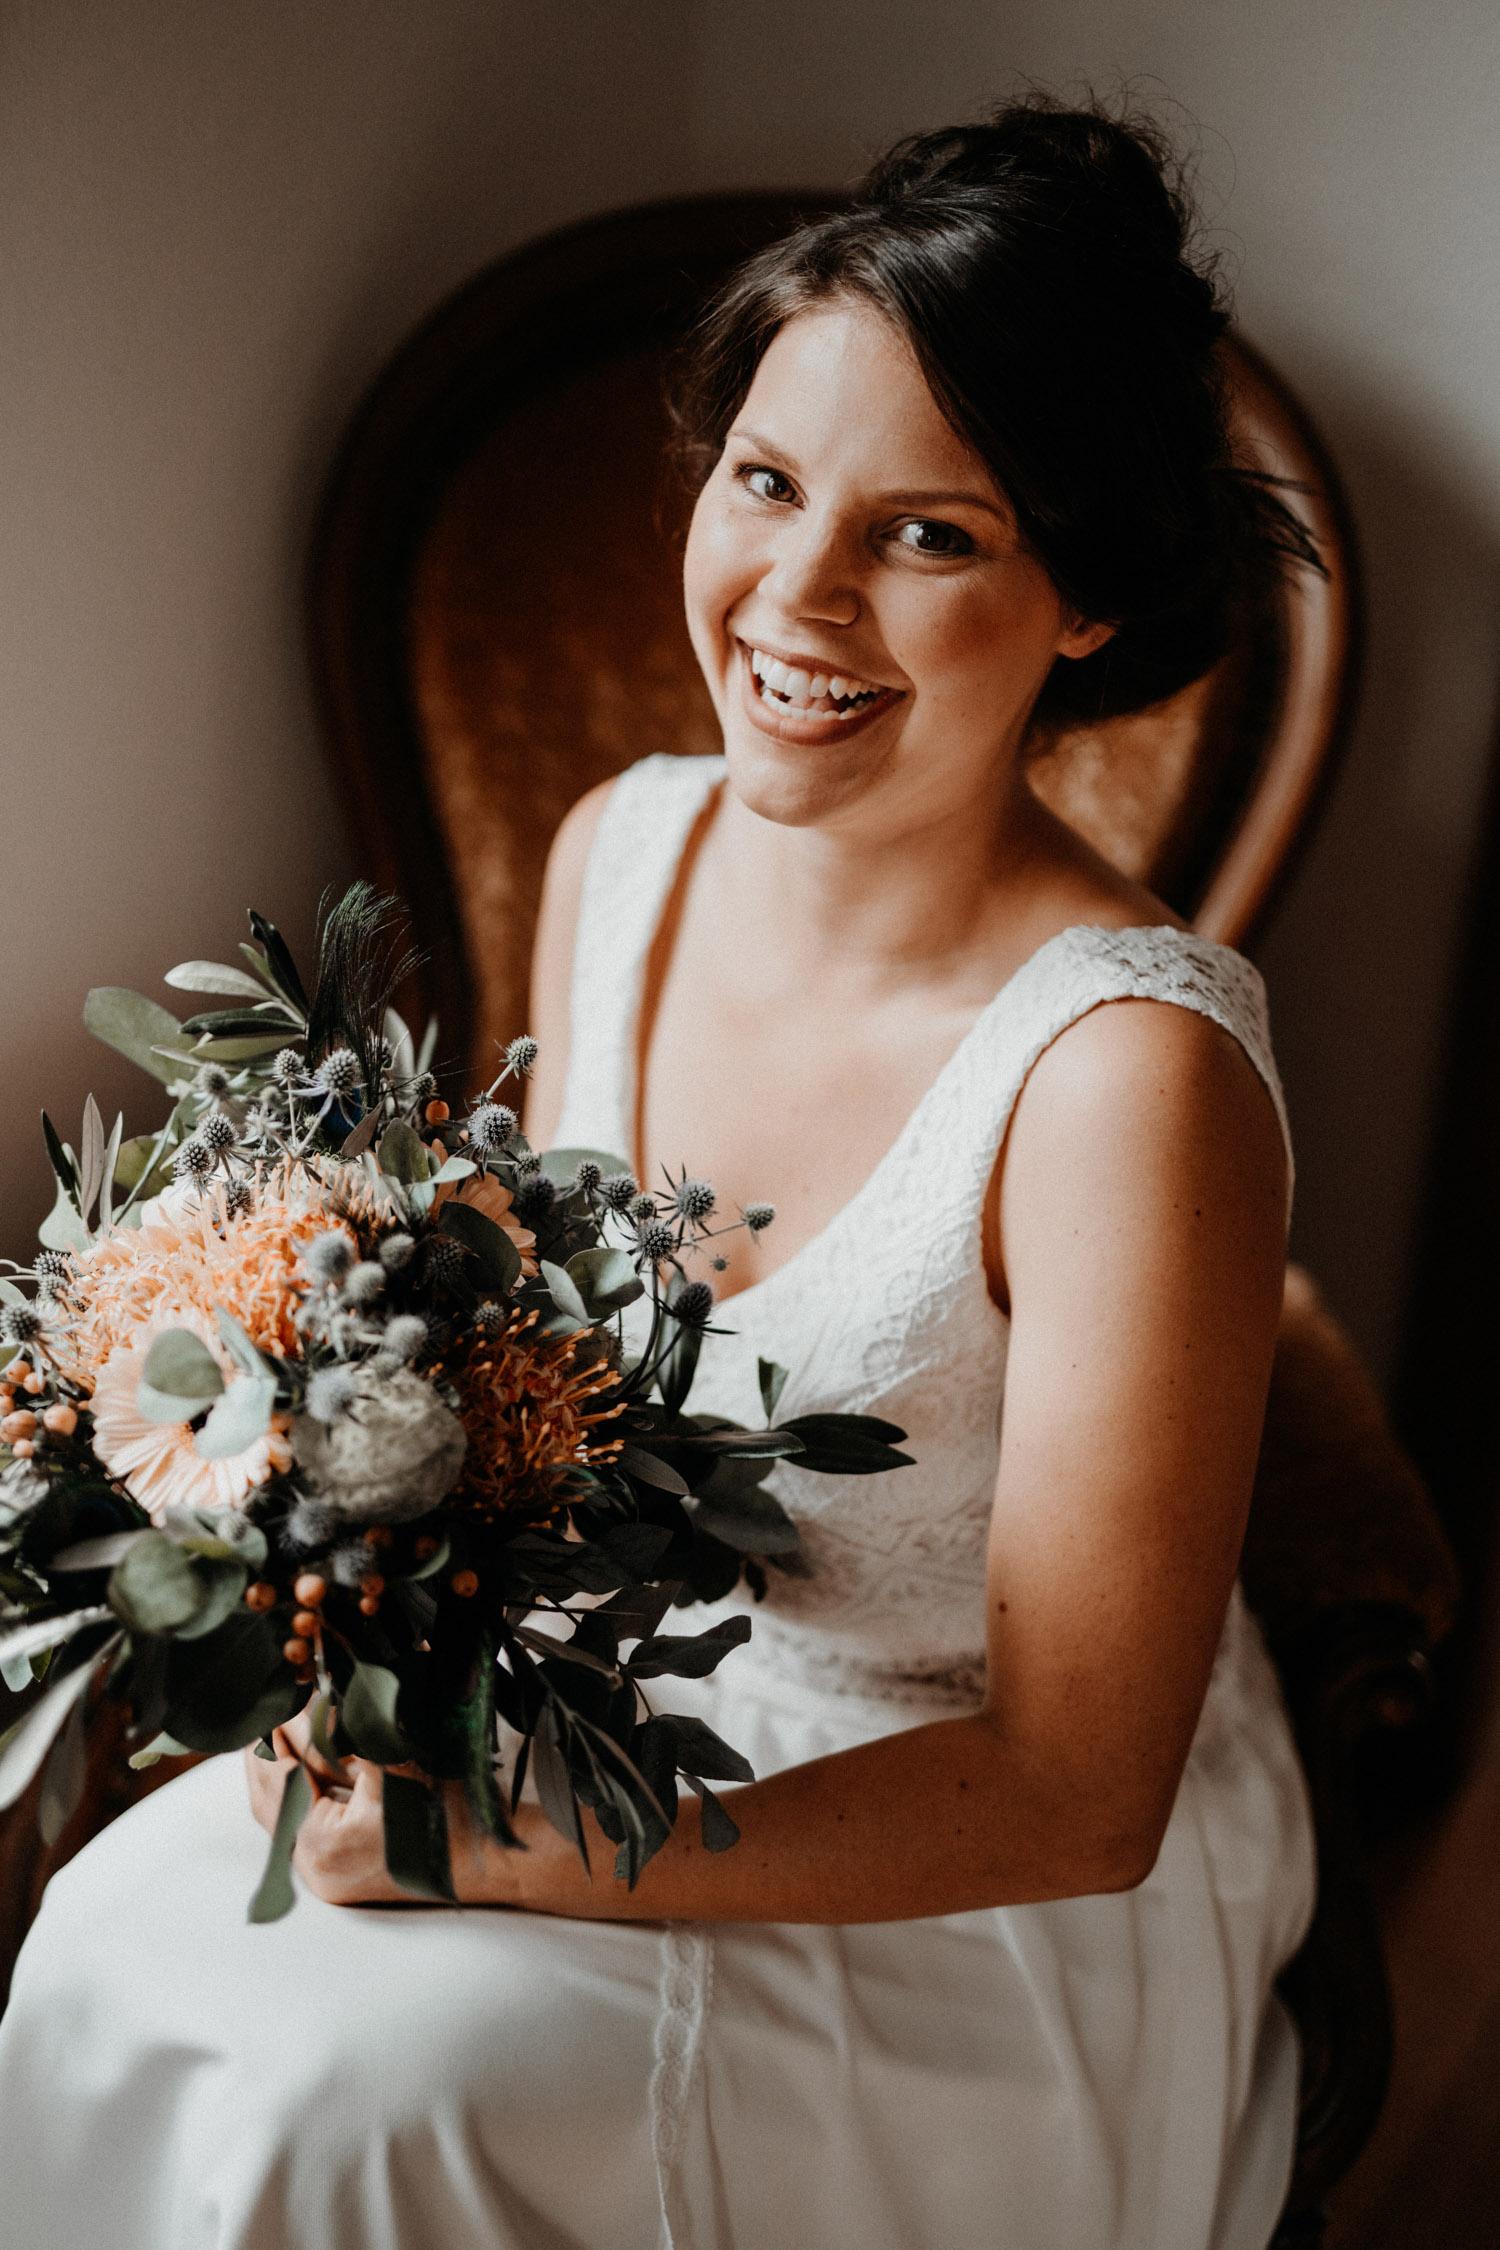 Vintage Industrial Bohemian Wedding in Switzerland wedding photographer elopement photographer getting ready bride portrait